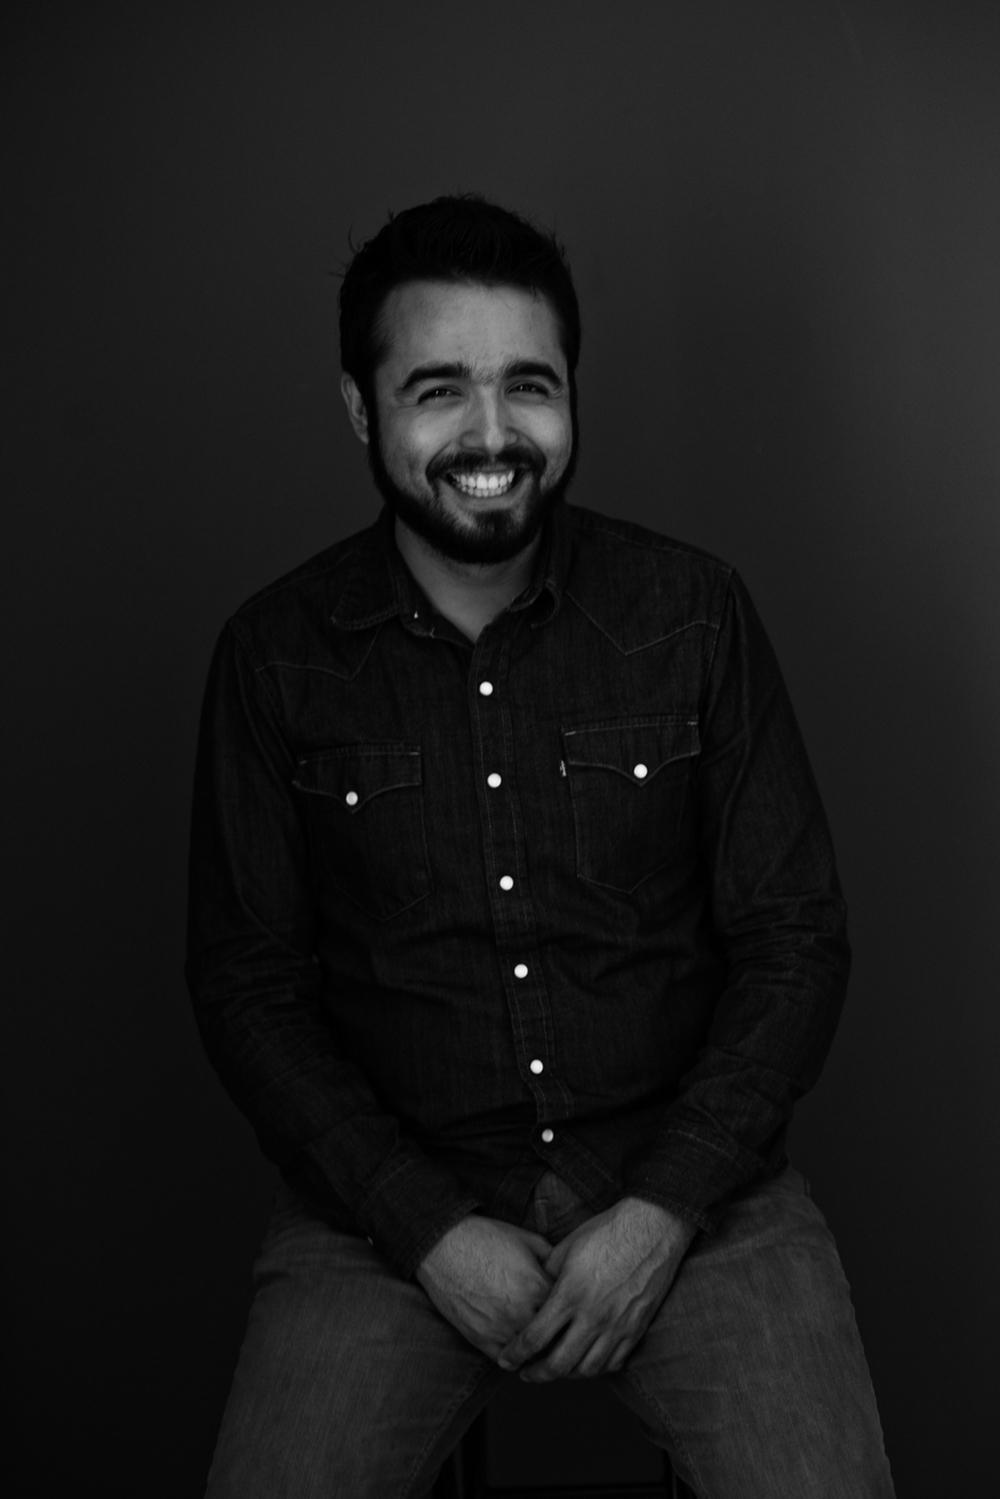 Sesion-fotos-mexicali-retrato-couples-Oscar-jeans-camisa-mezclilla-blanco-negro-sitdown